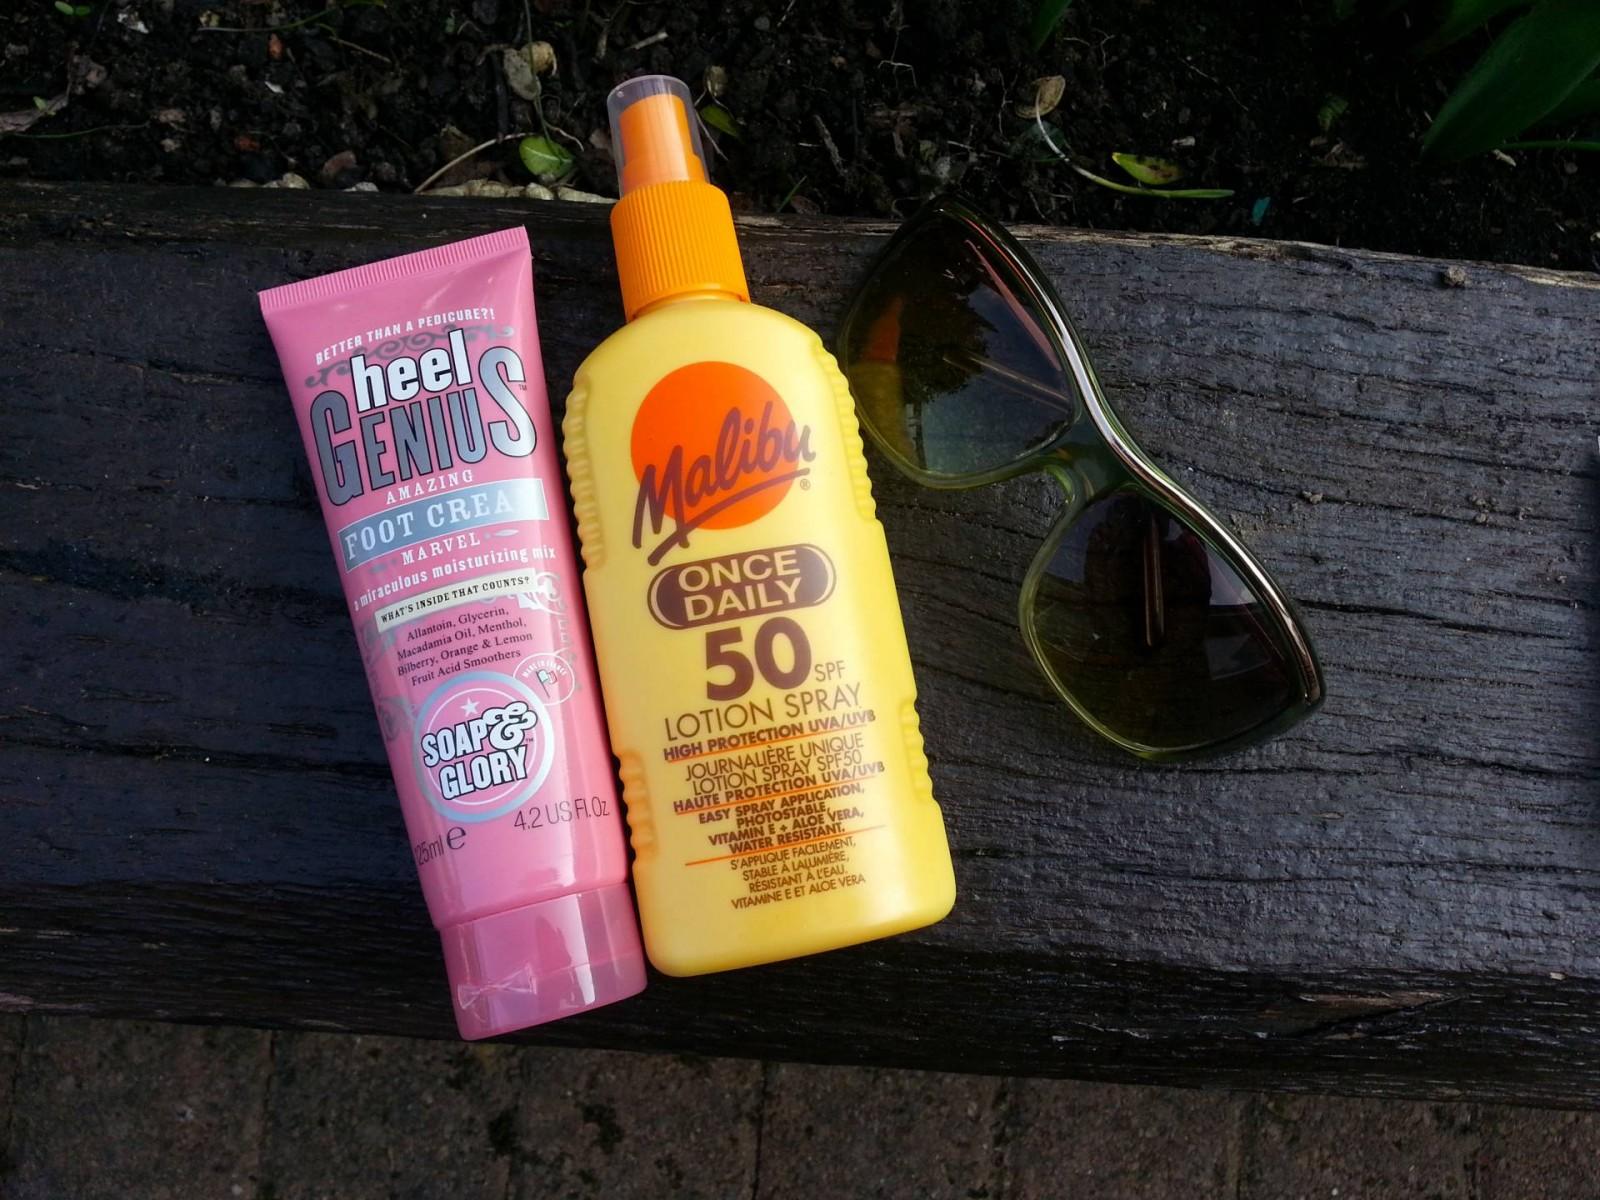 Soap and Glory Heel Genius Malibu SPF 50 suncream Salvatore Ferragmo sunglasses